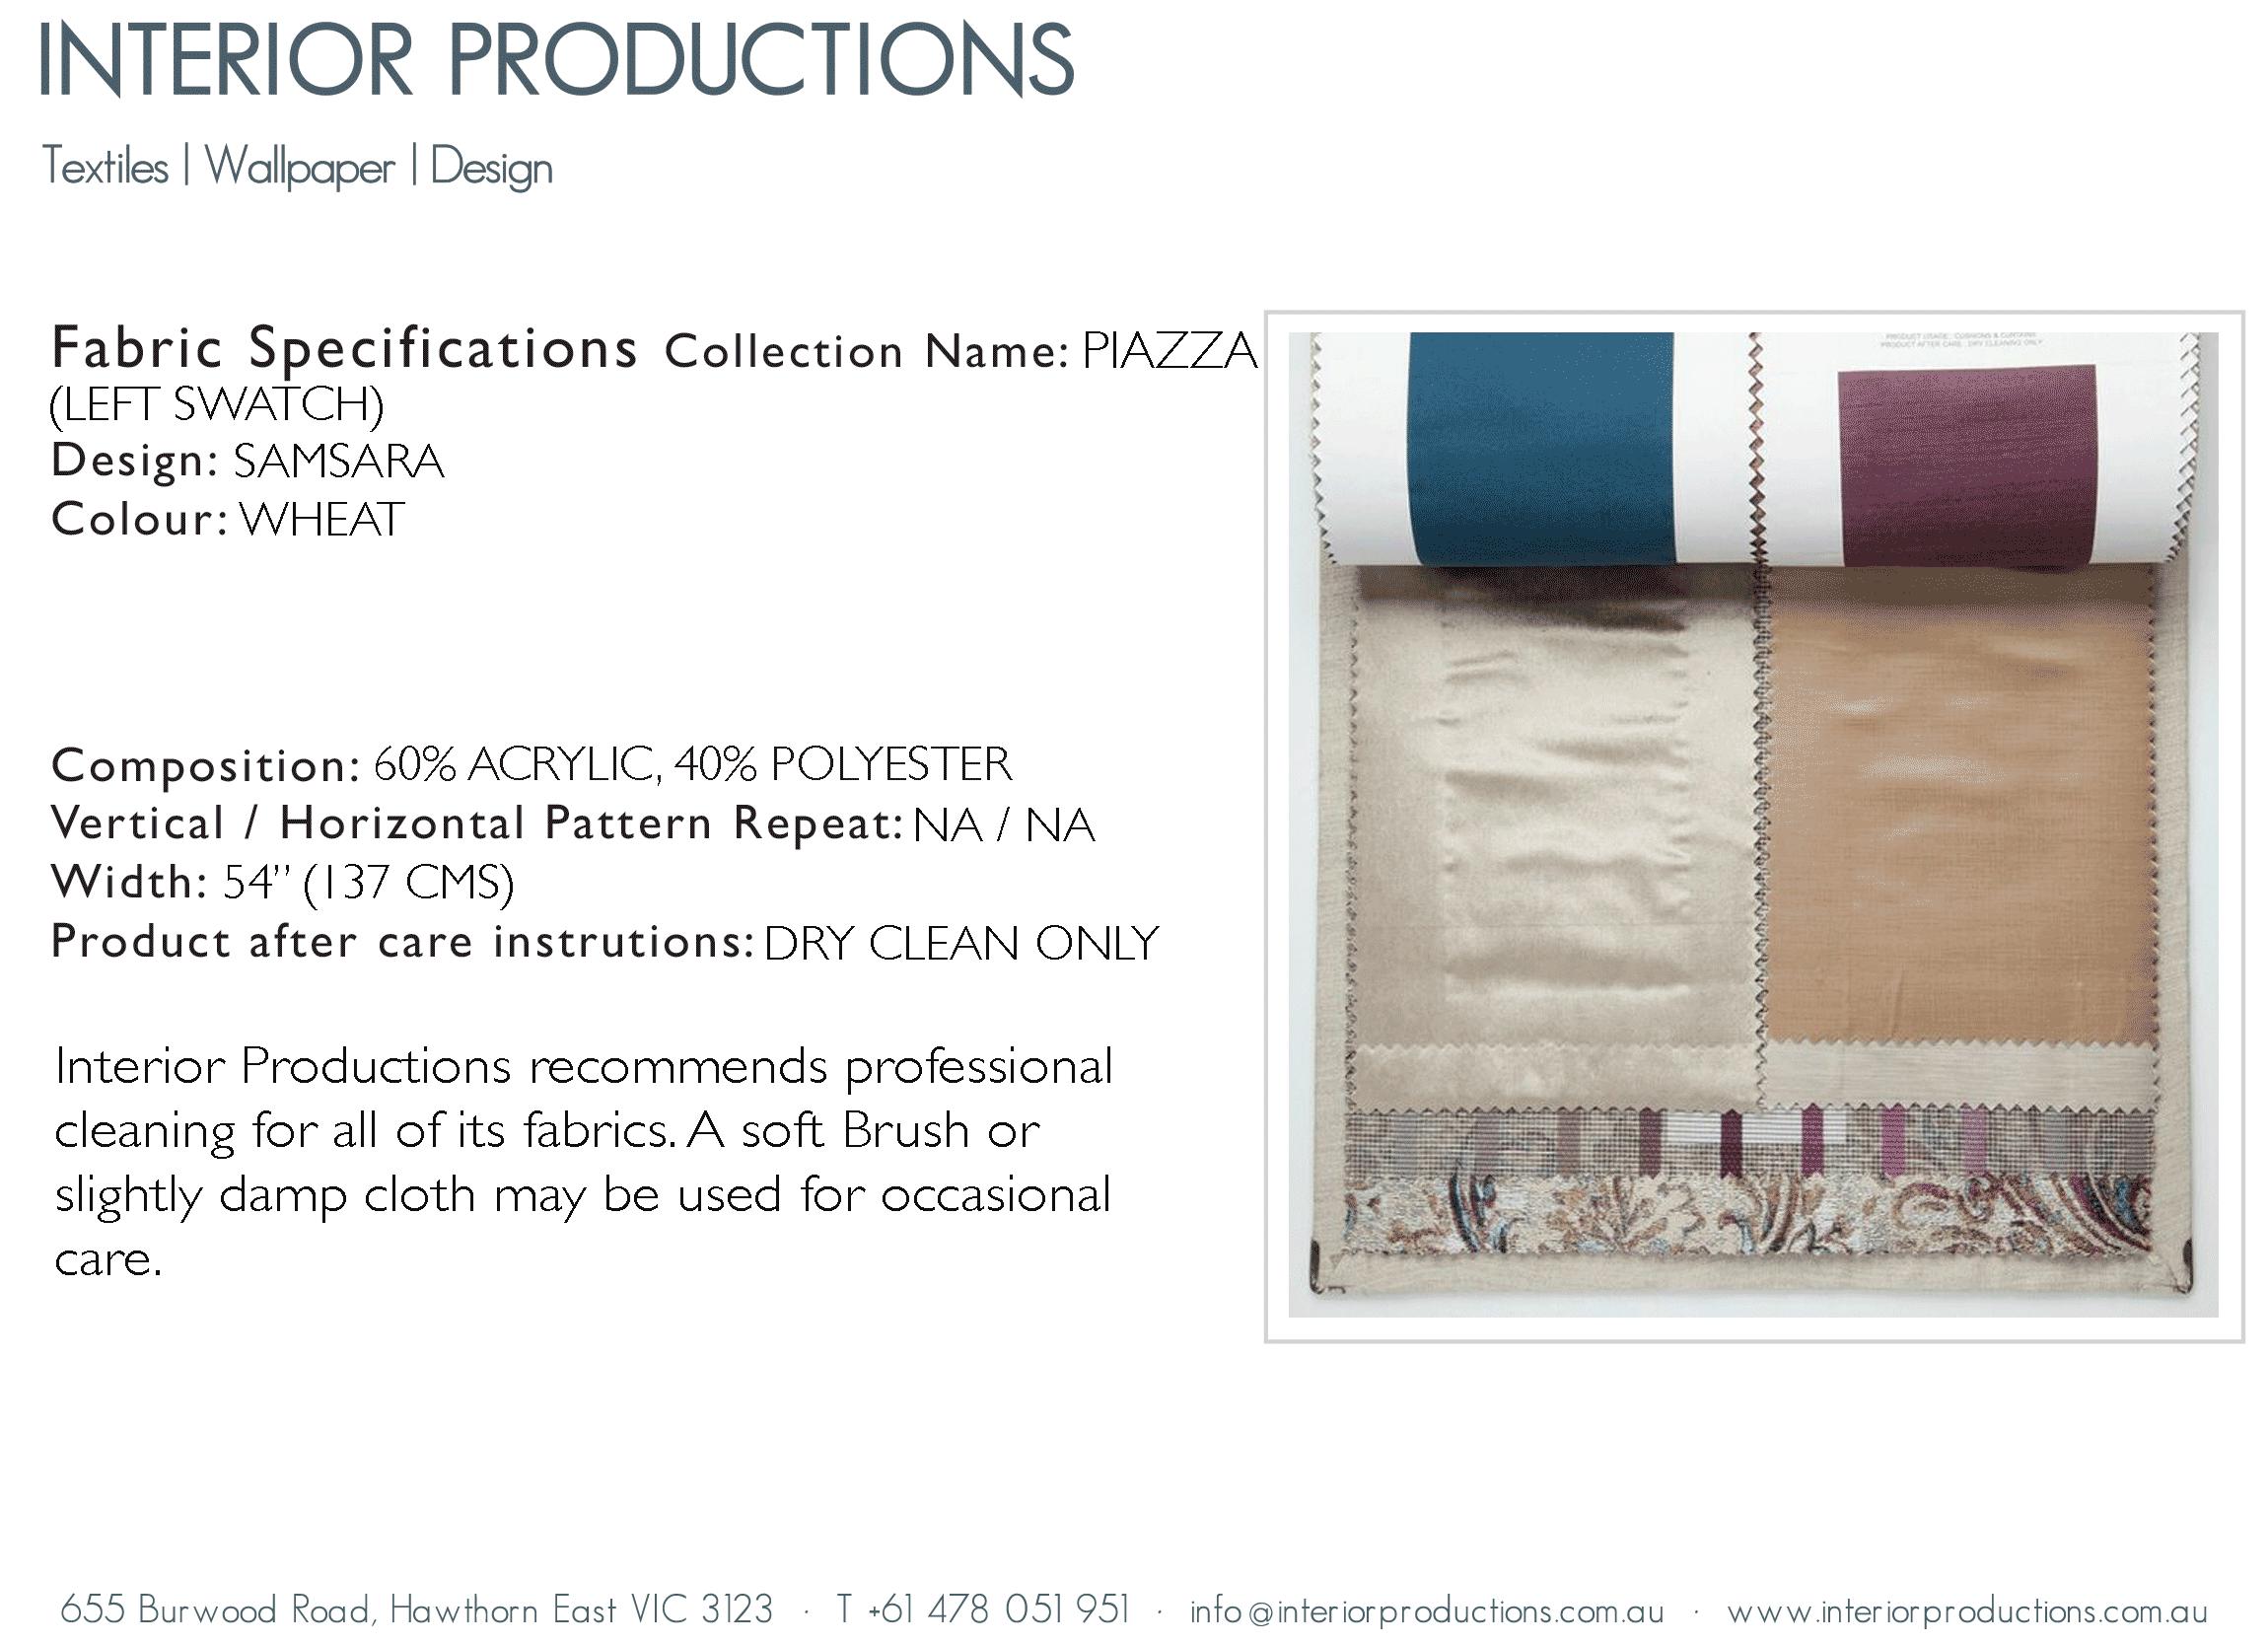 interior_productions_SAMSARA---WHEAT